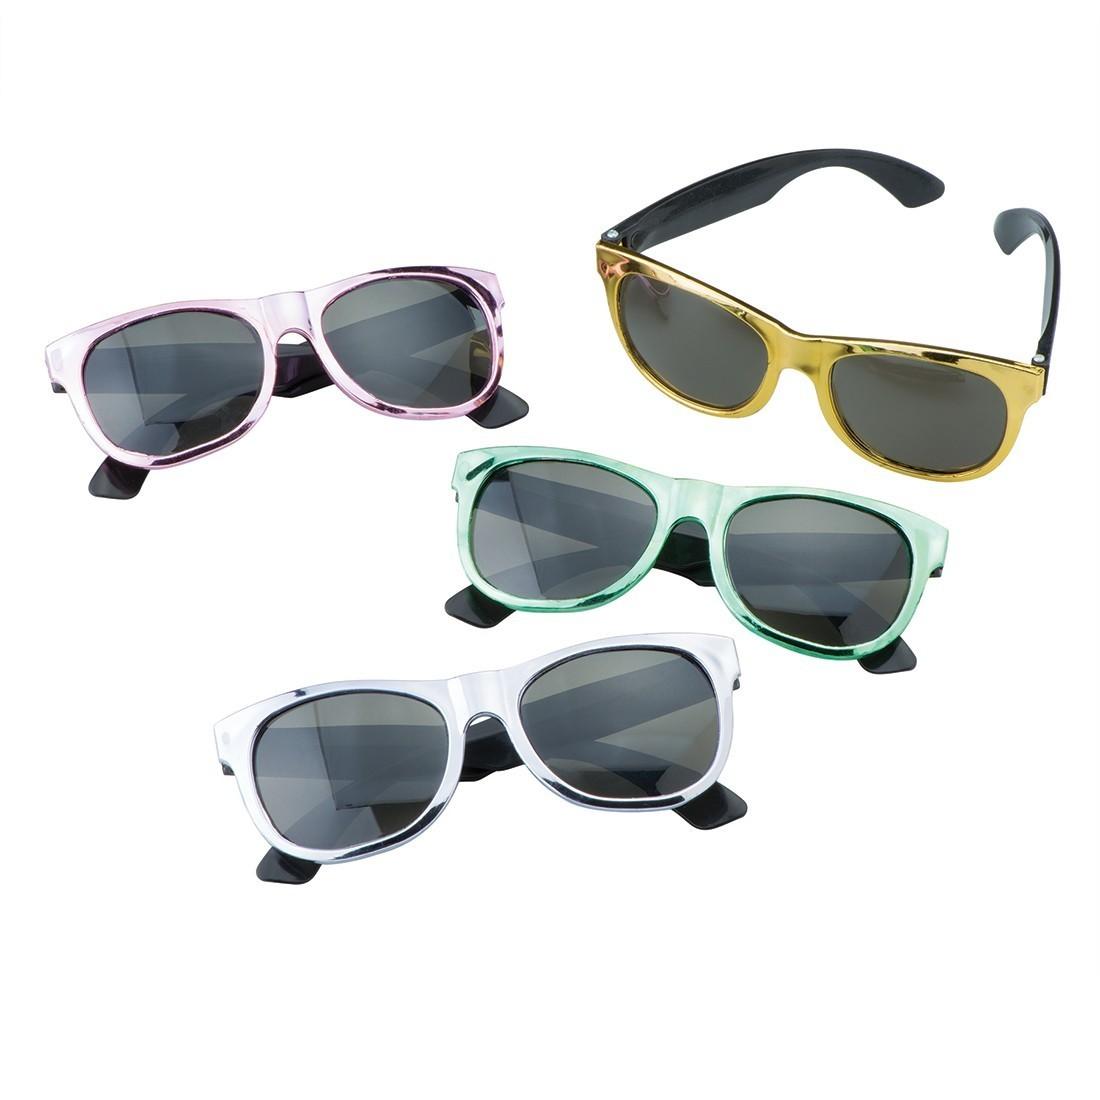 Standard Metallic Sunglasses [image]